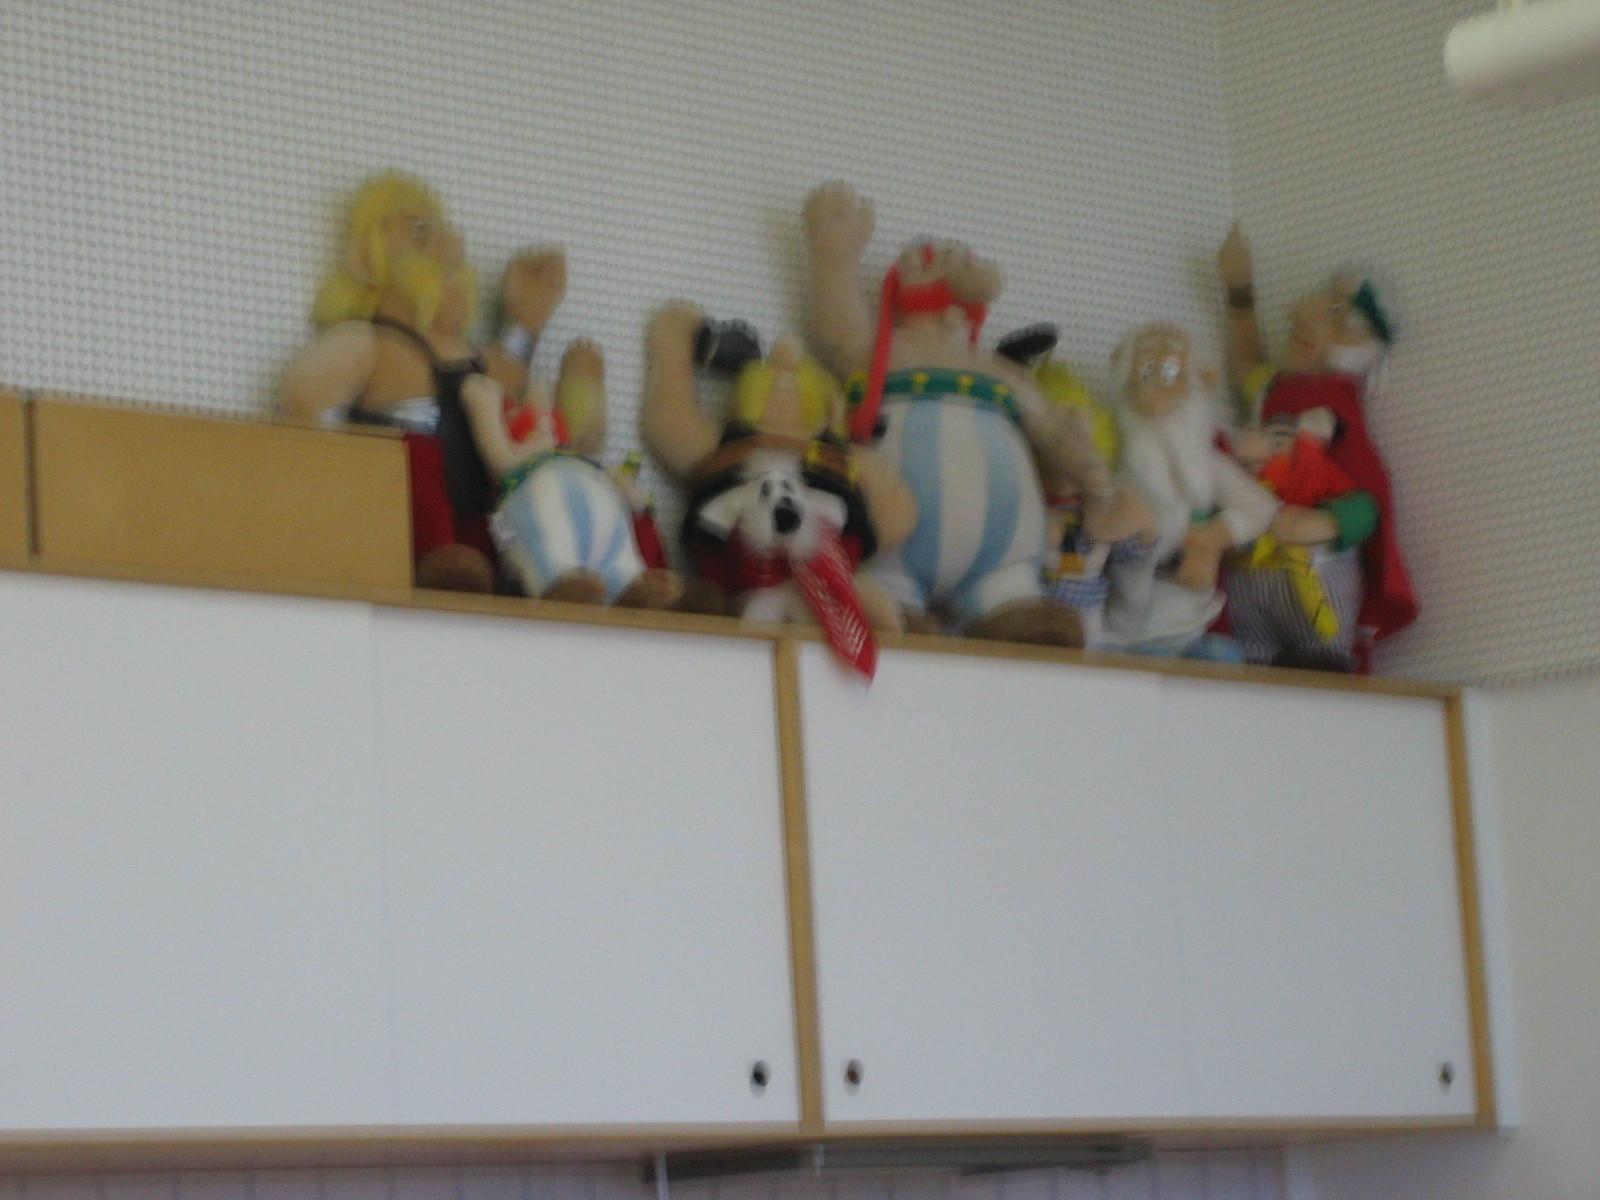 Asterix und Obelix